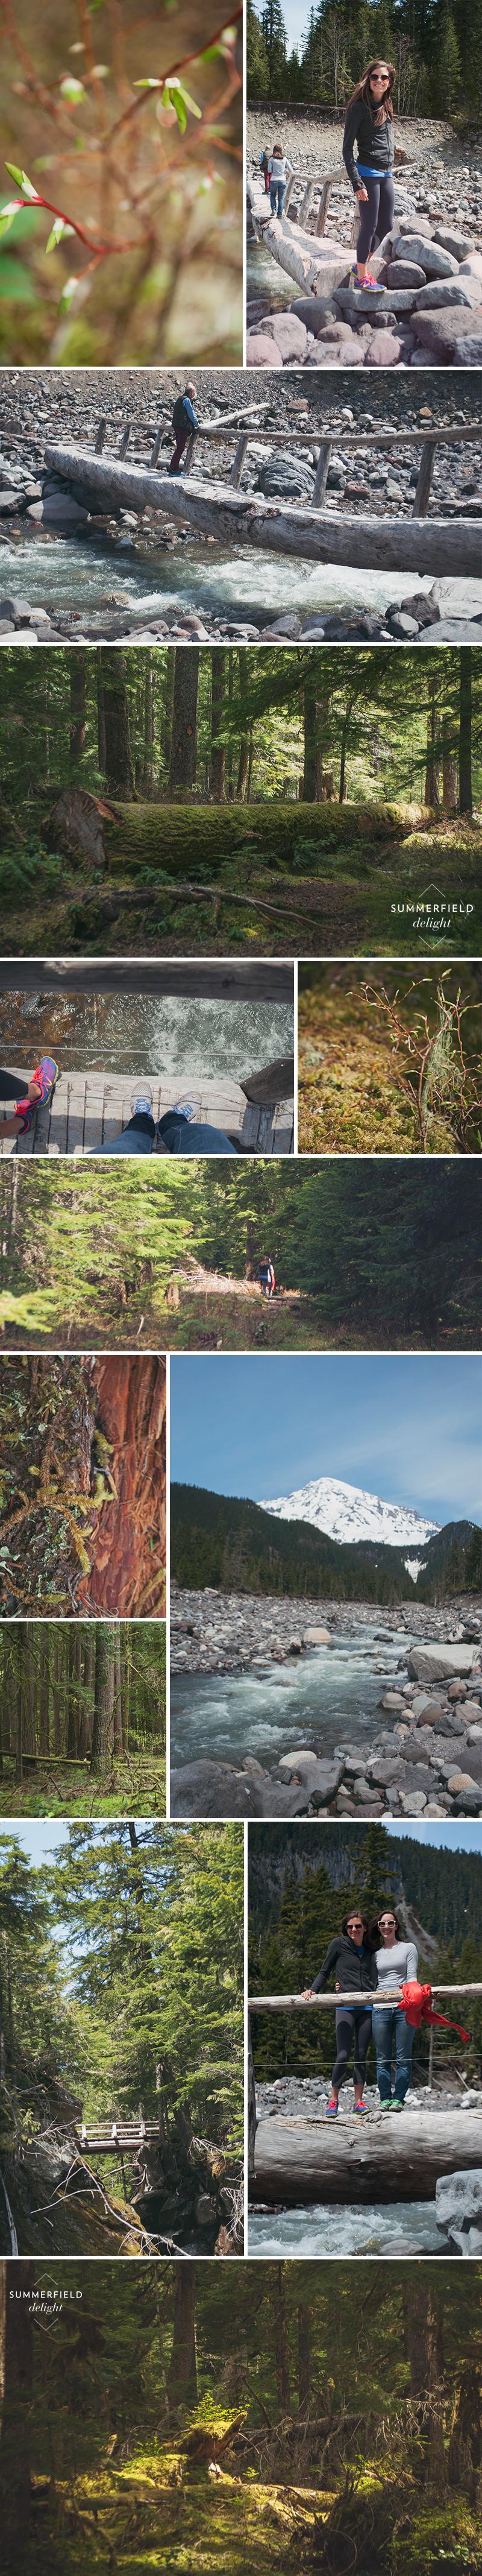 Summerfield Delight | Mt Rainer Trails